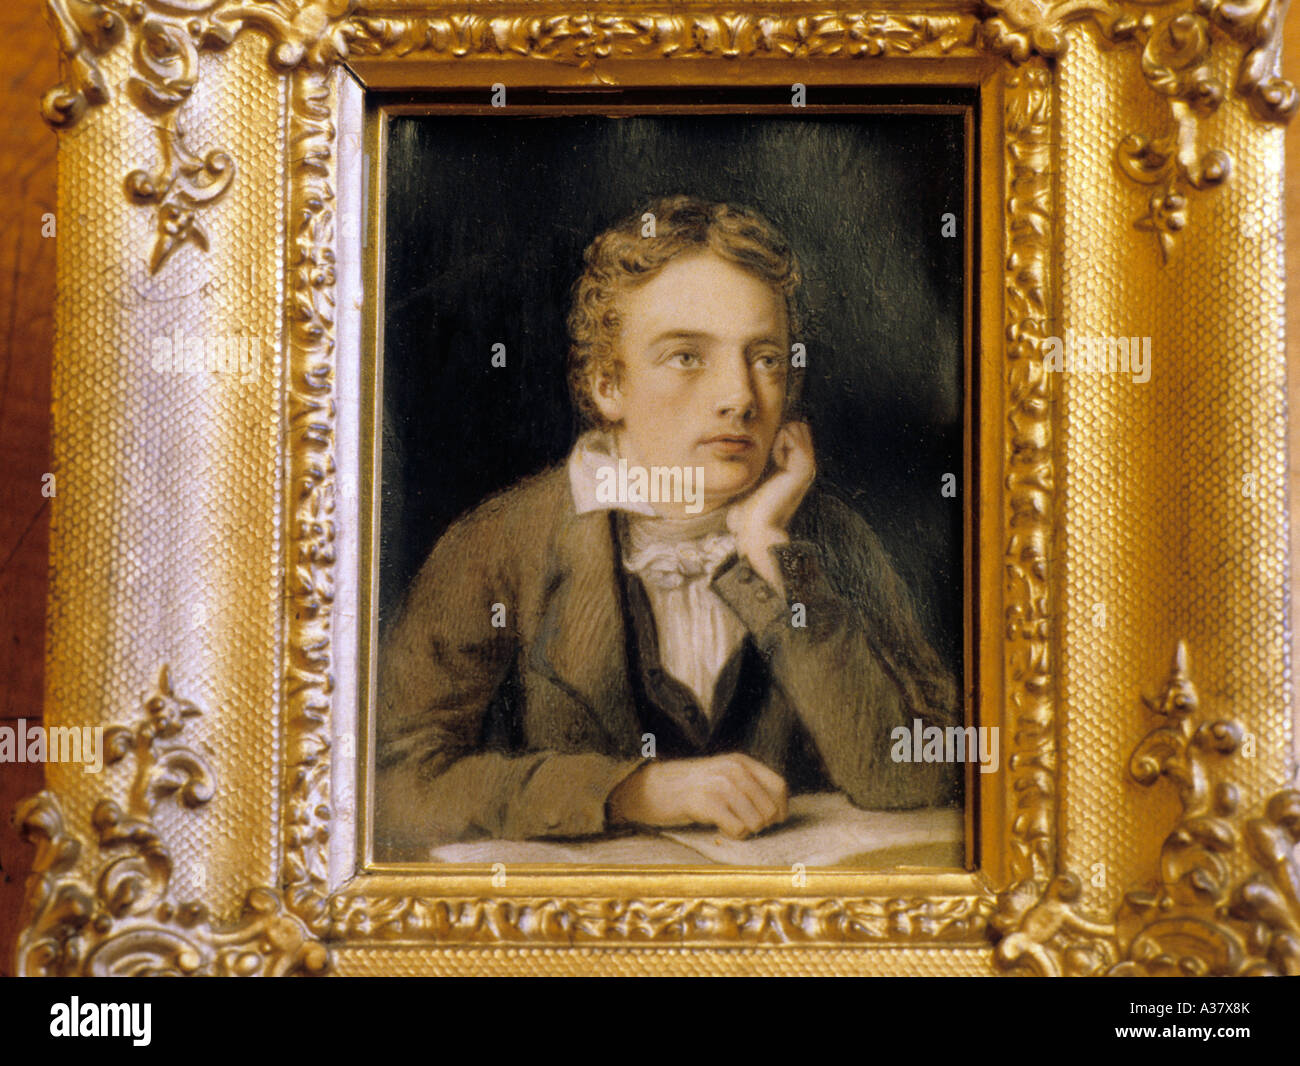 Littérature Romantique Anglaise john keats, poète romantique, la littérature anglaise, portrait par